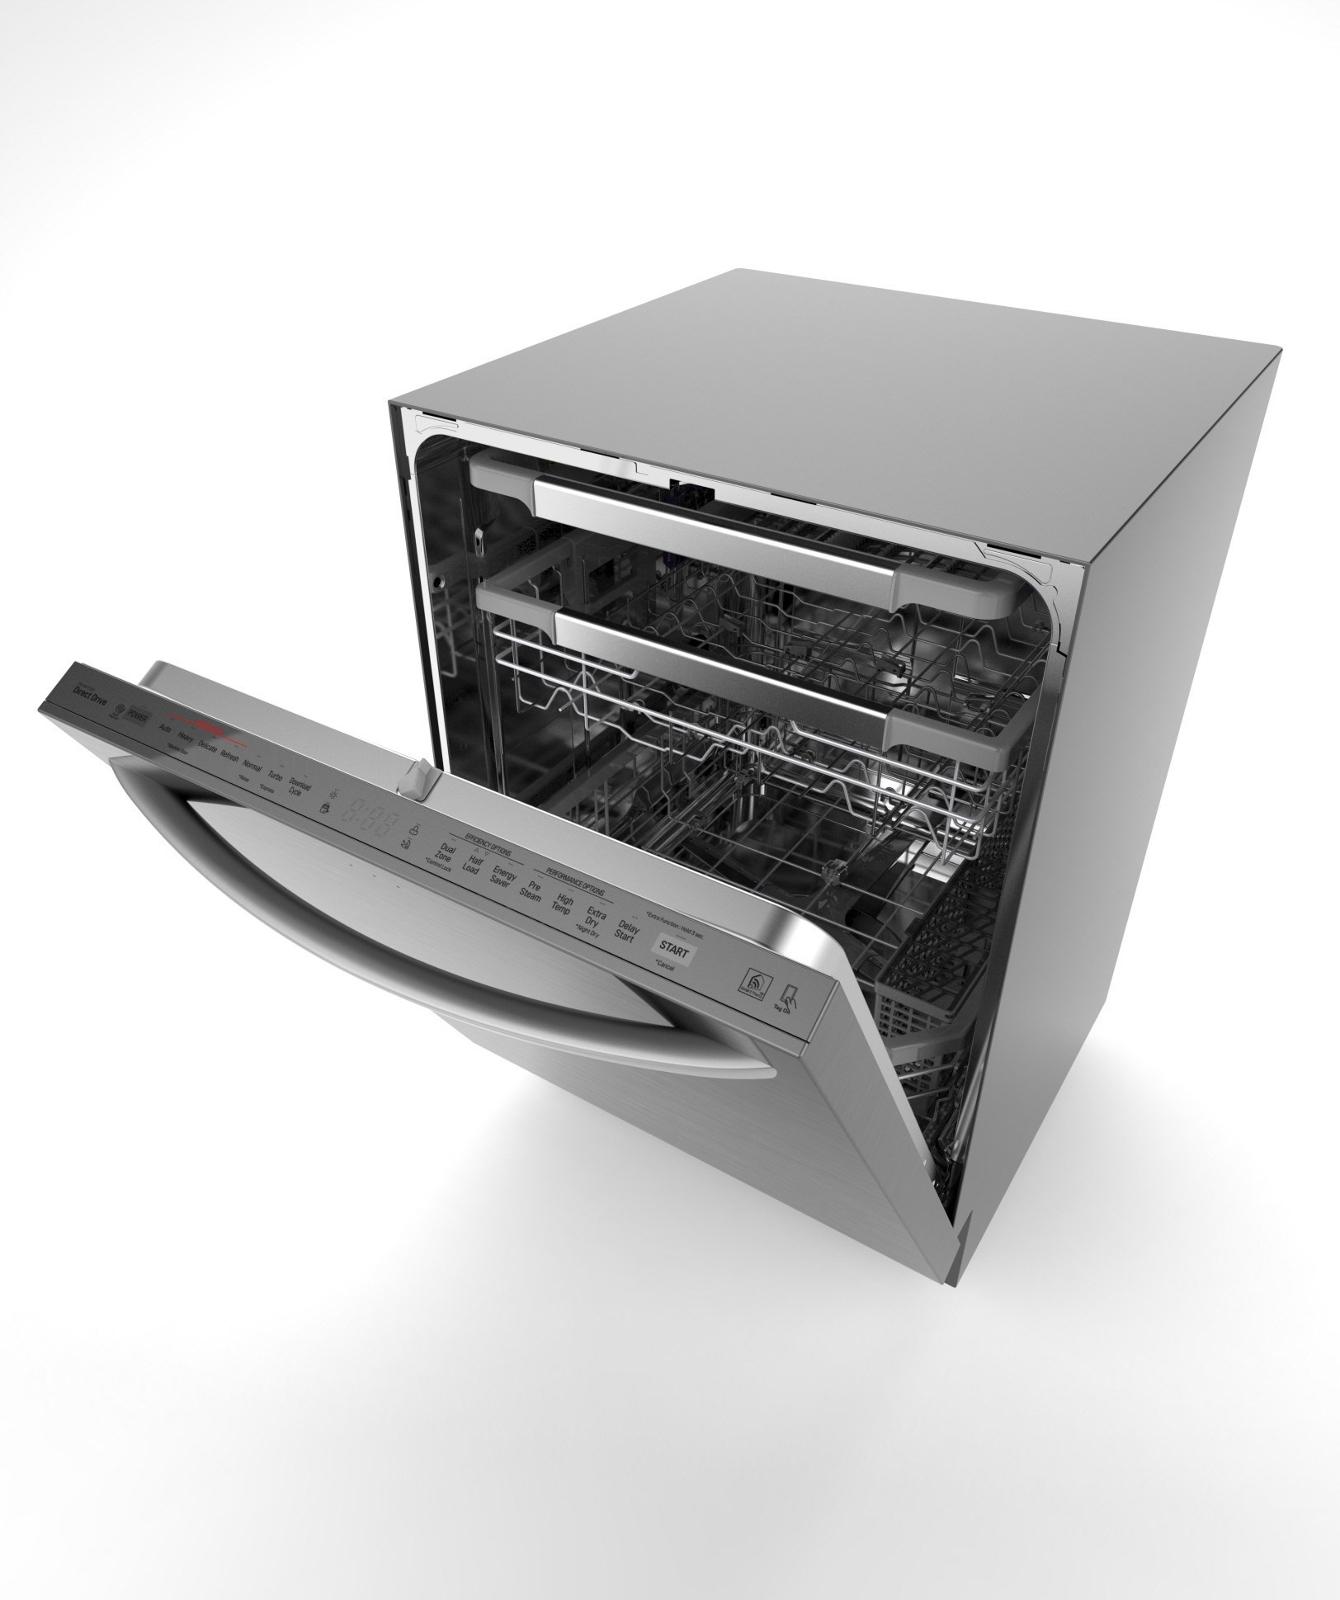 LG LDT8786ST Dishwasher